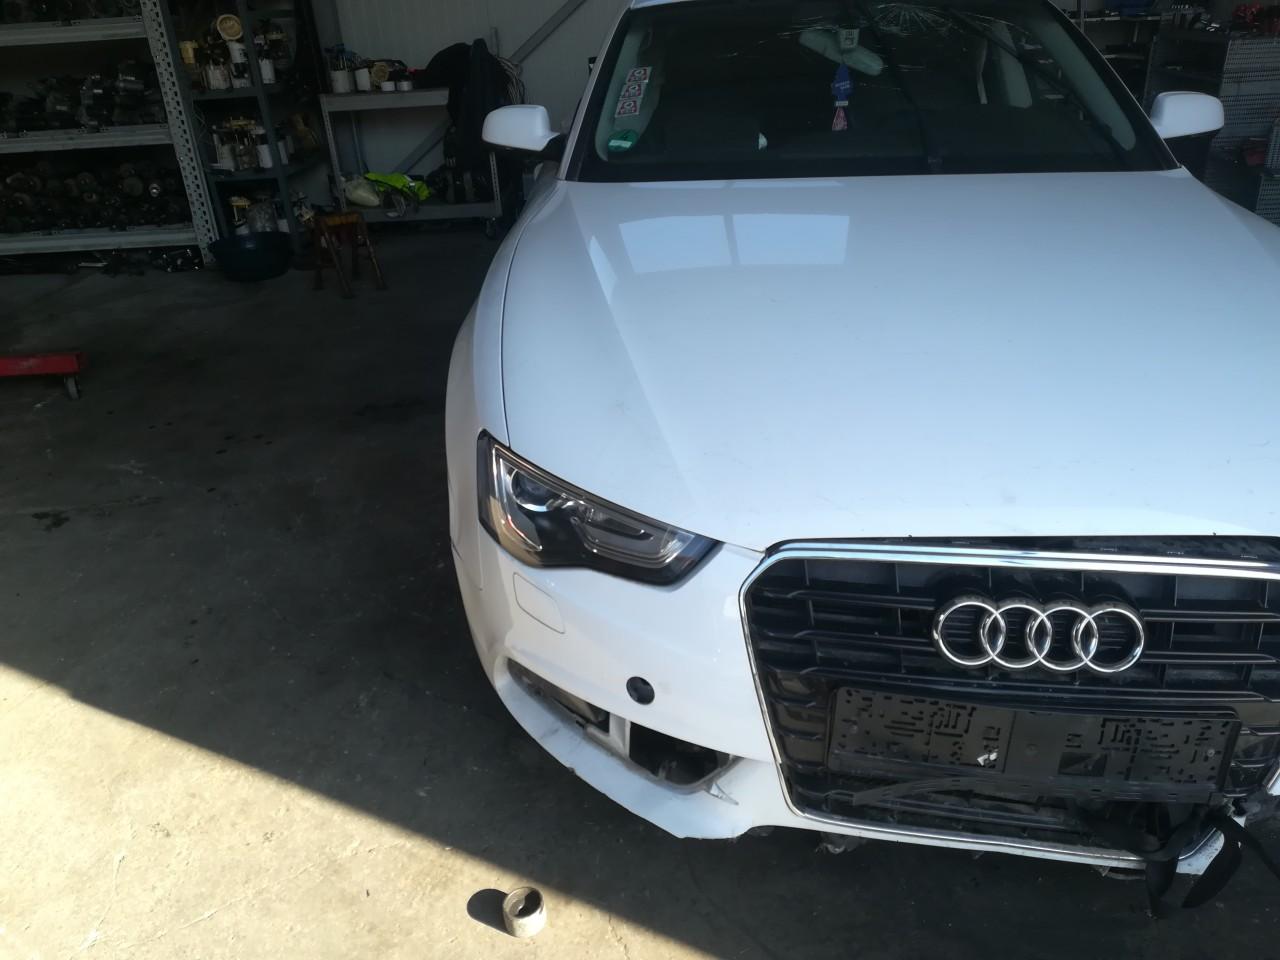 Dezmembrez Audi A5 facelift sportback 2.0 tdi CJC CJCD 2014